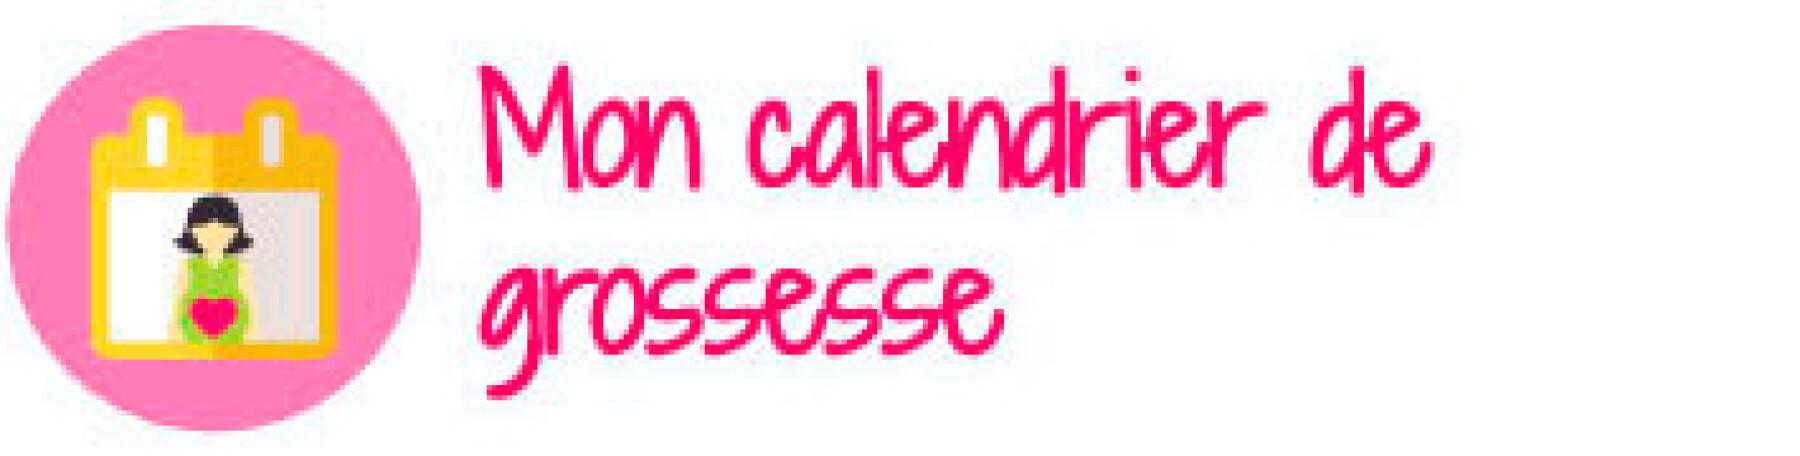 calendrier grossesse